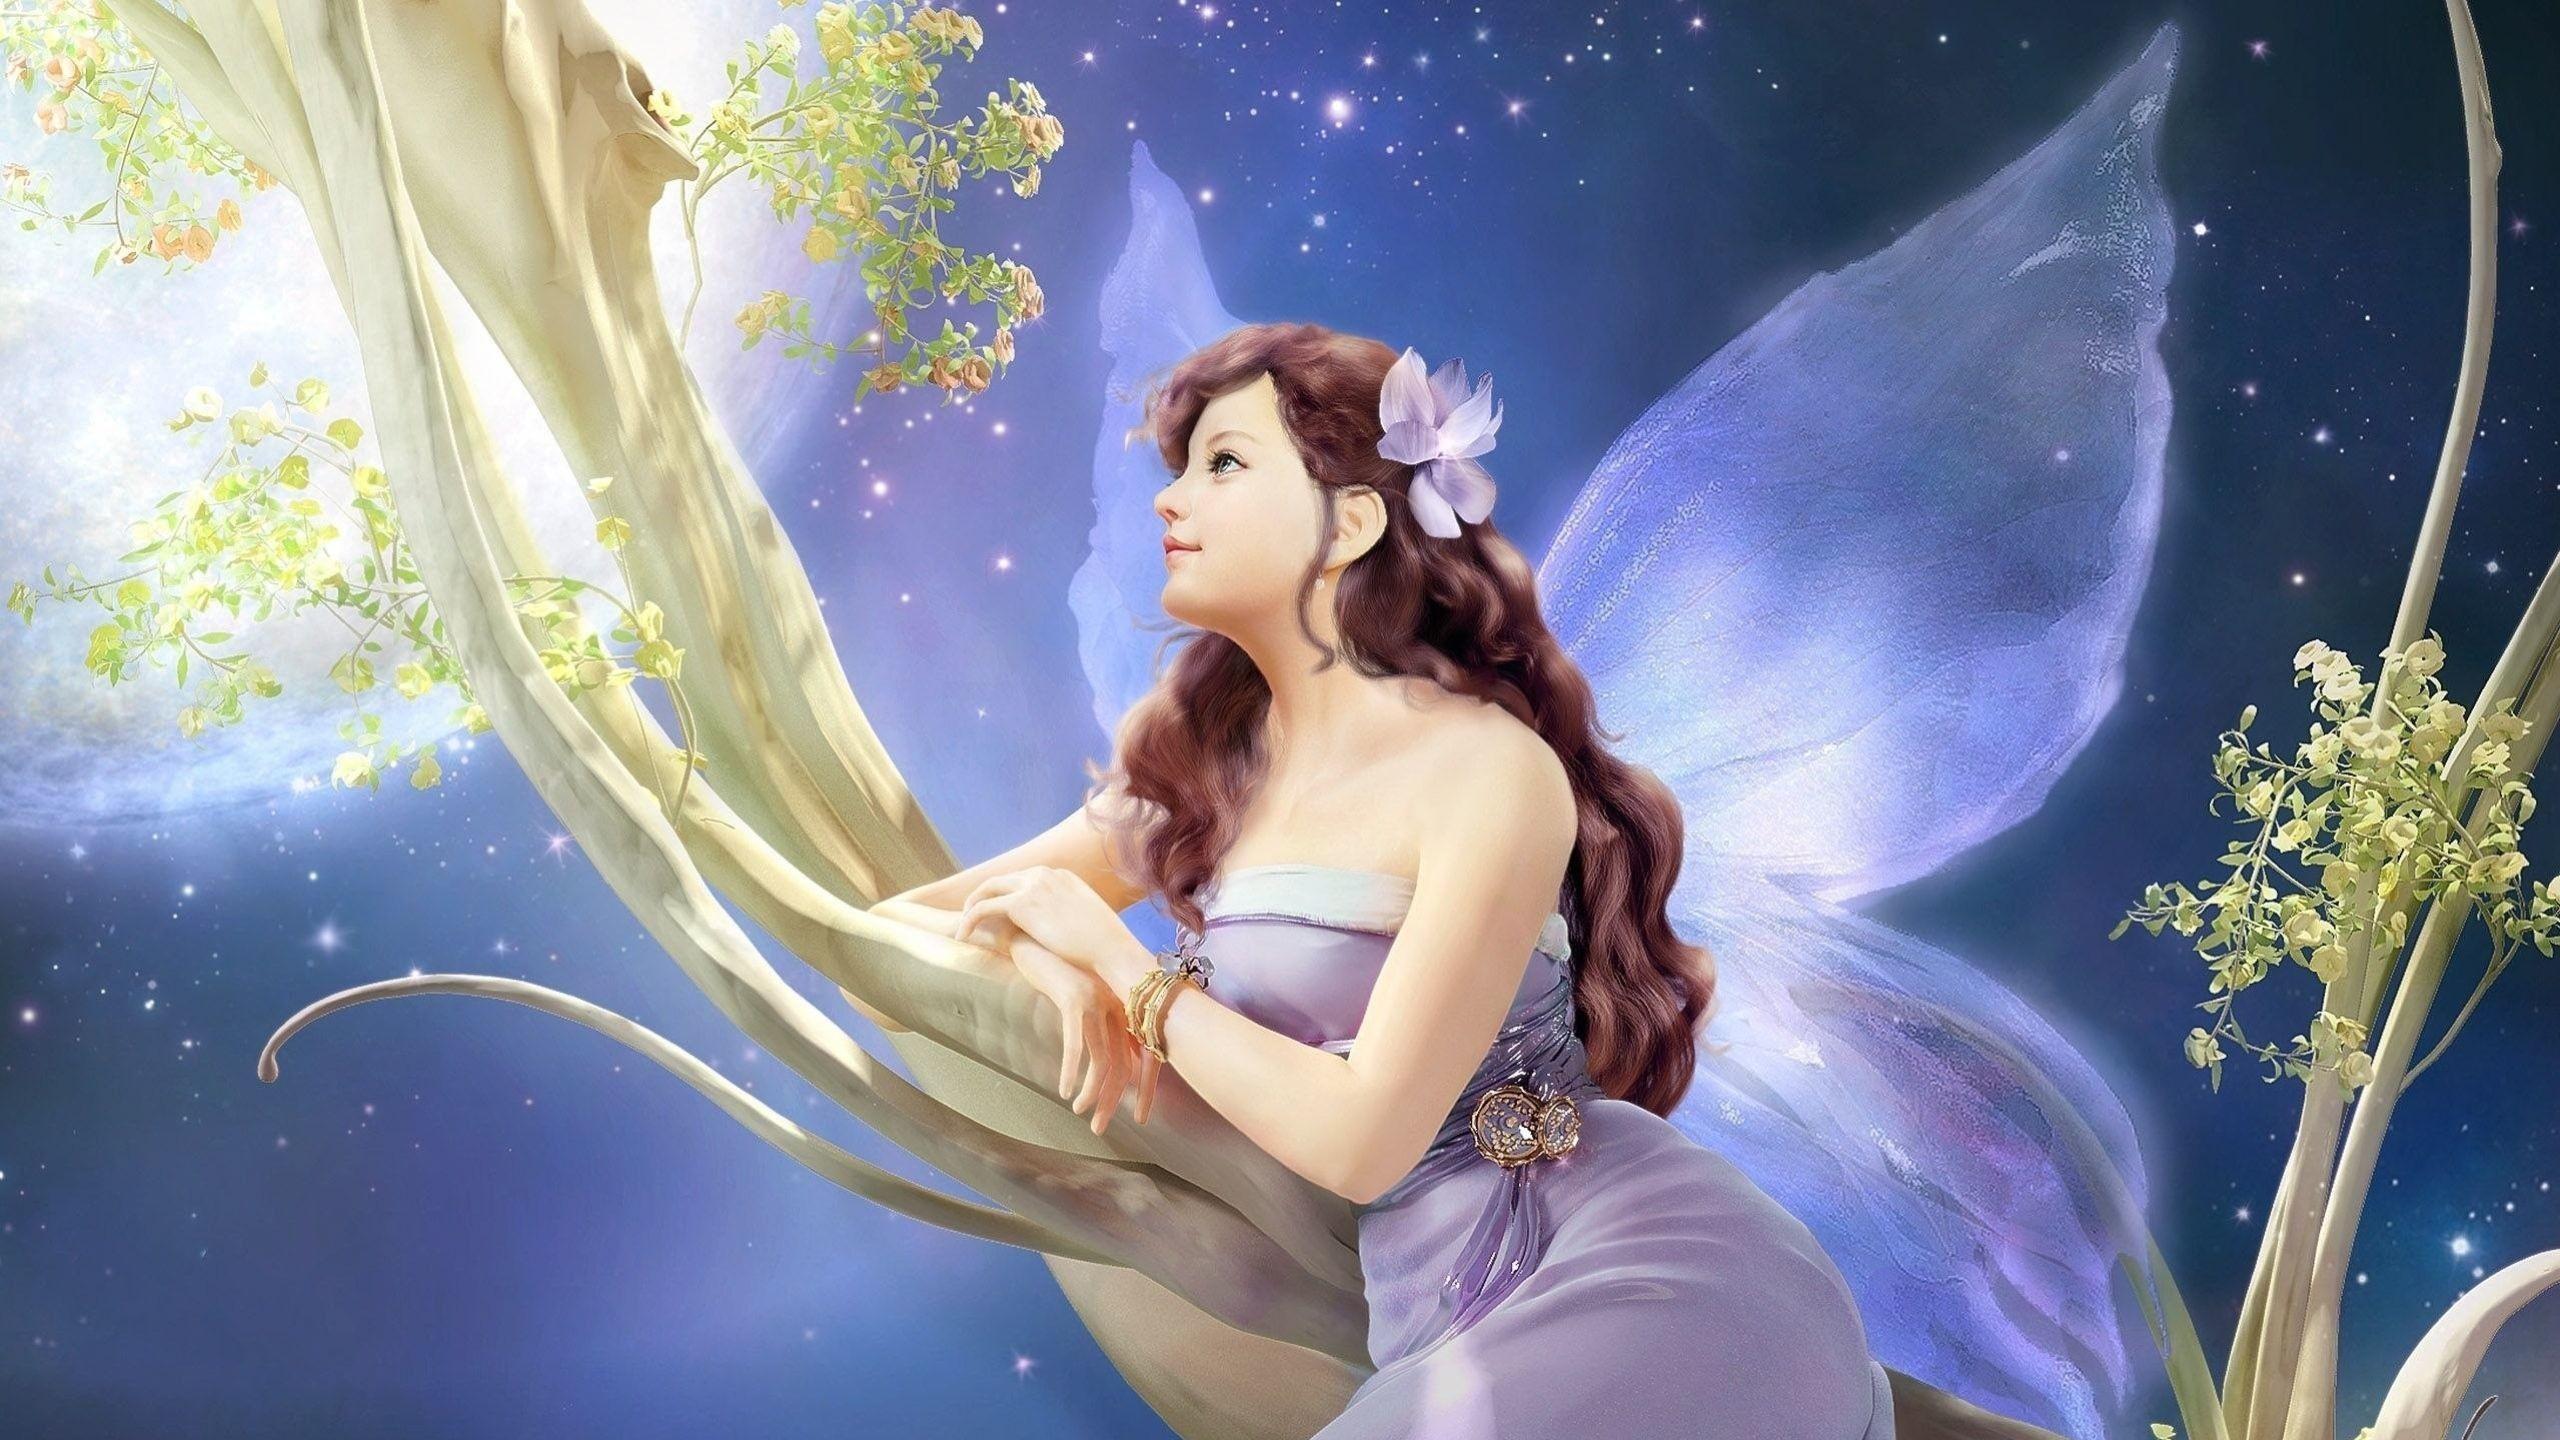 Res: 2560x1440, fantasy fairy - Google Search